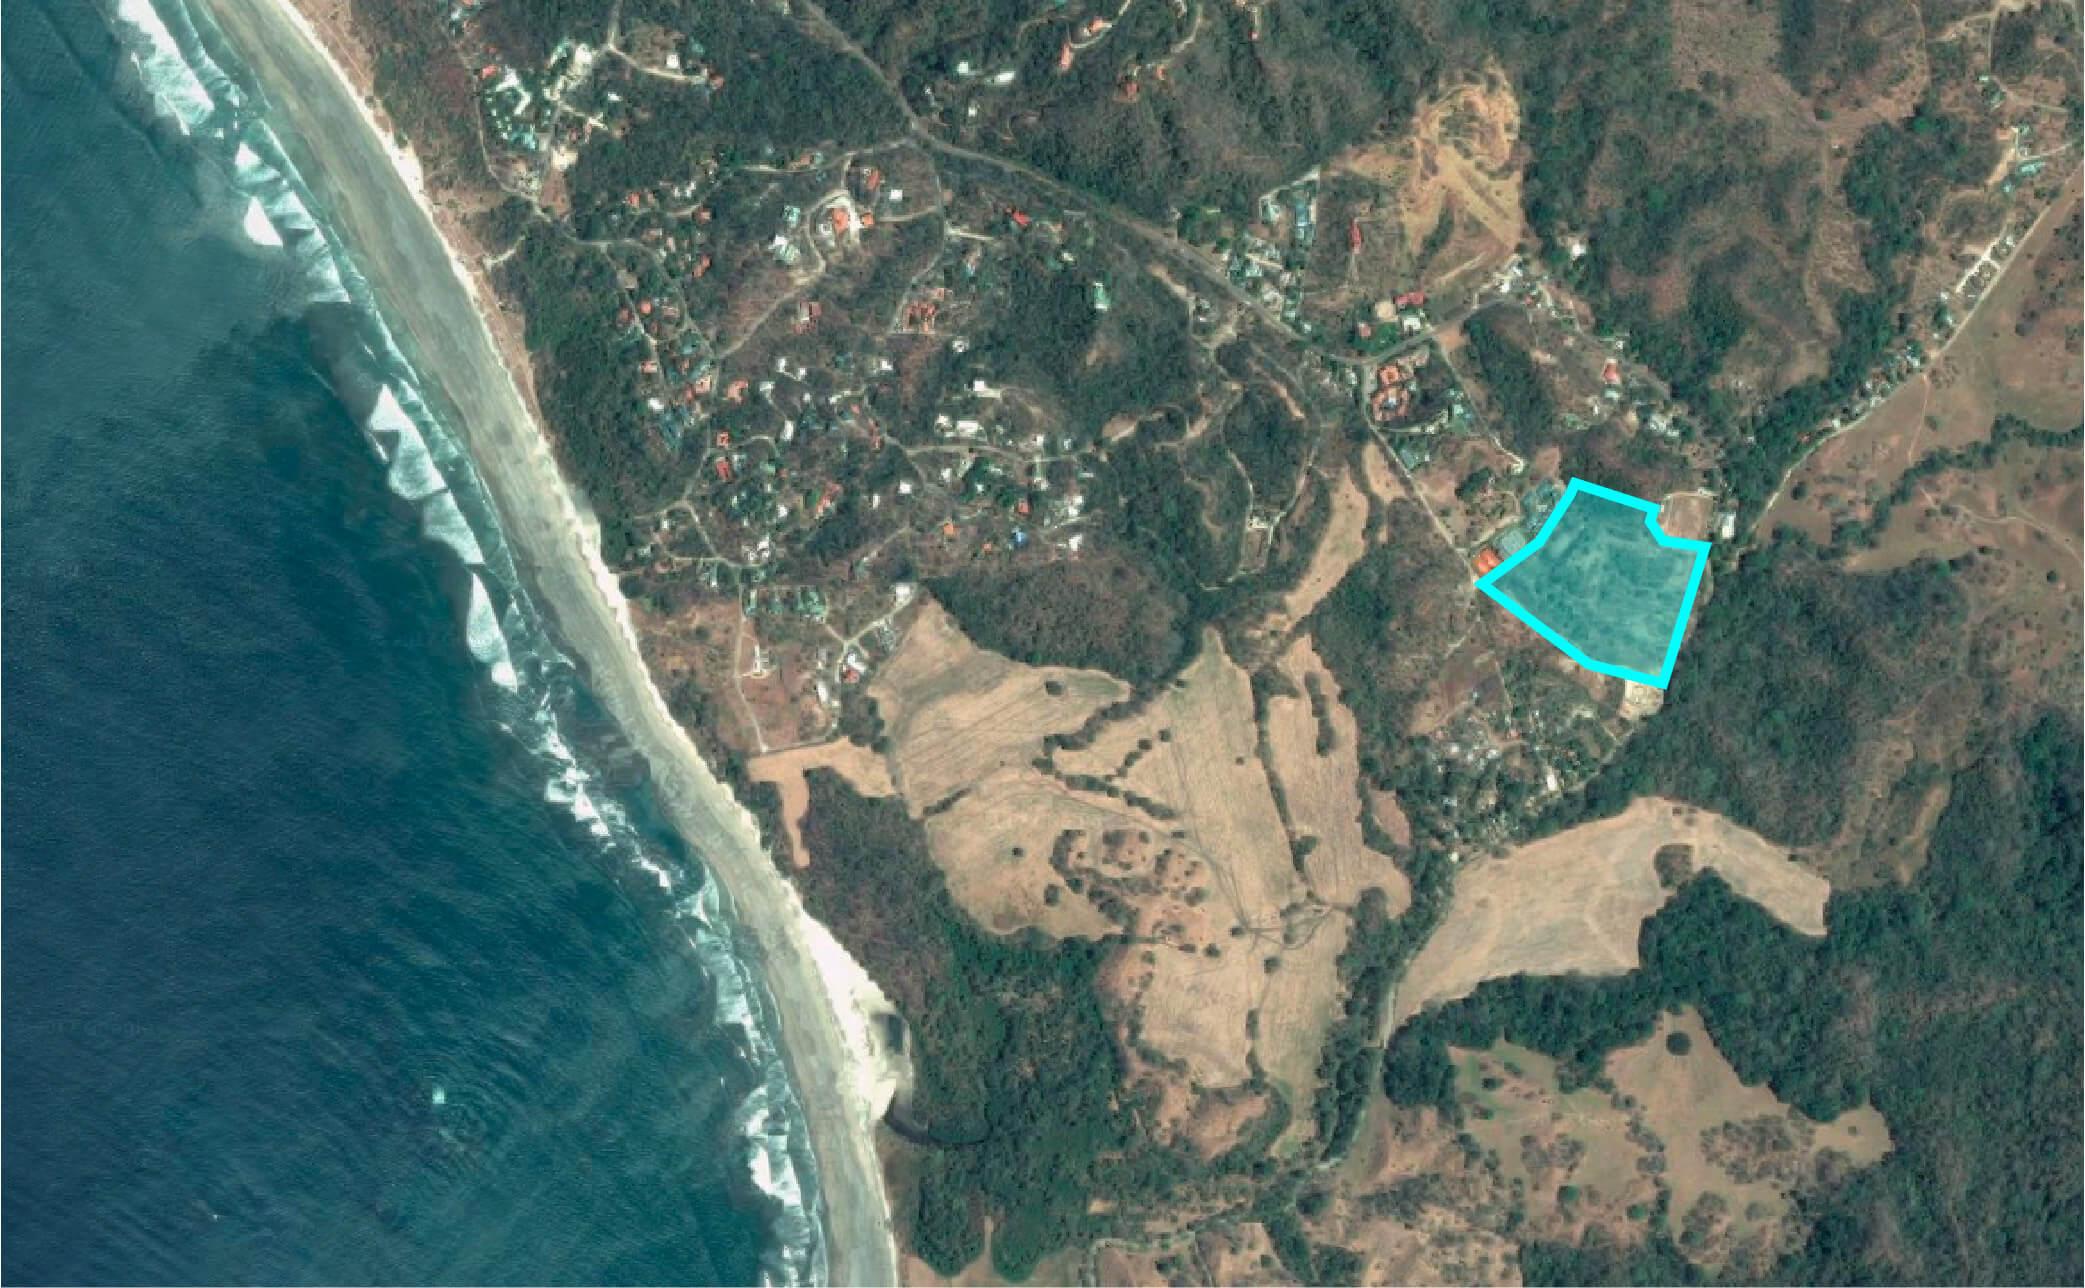 Aerial-Finca-Espanca-2-01.jpg